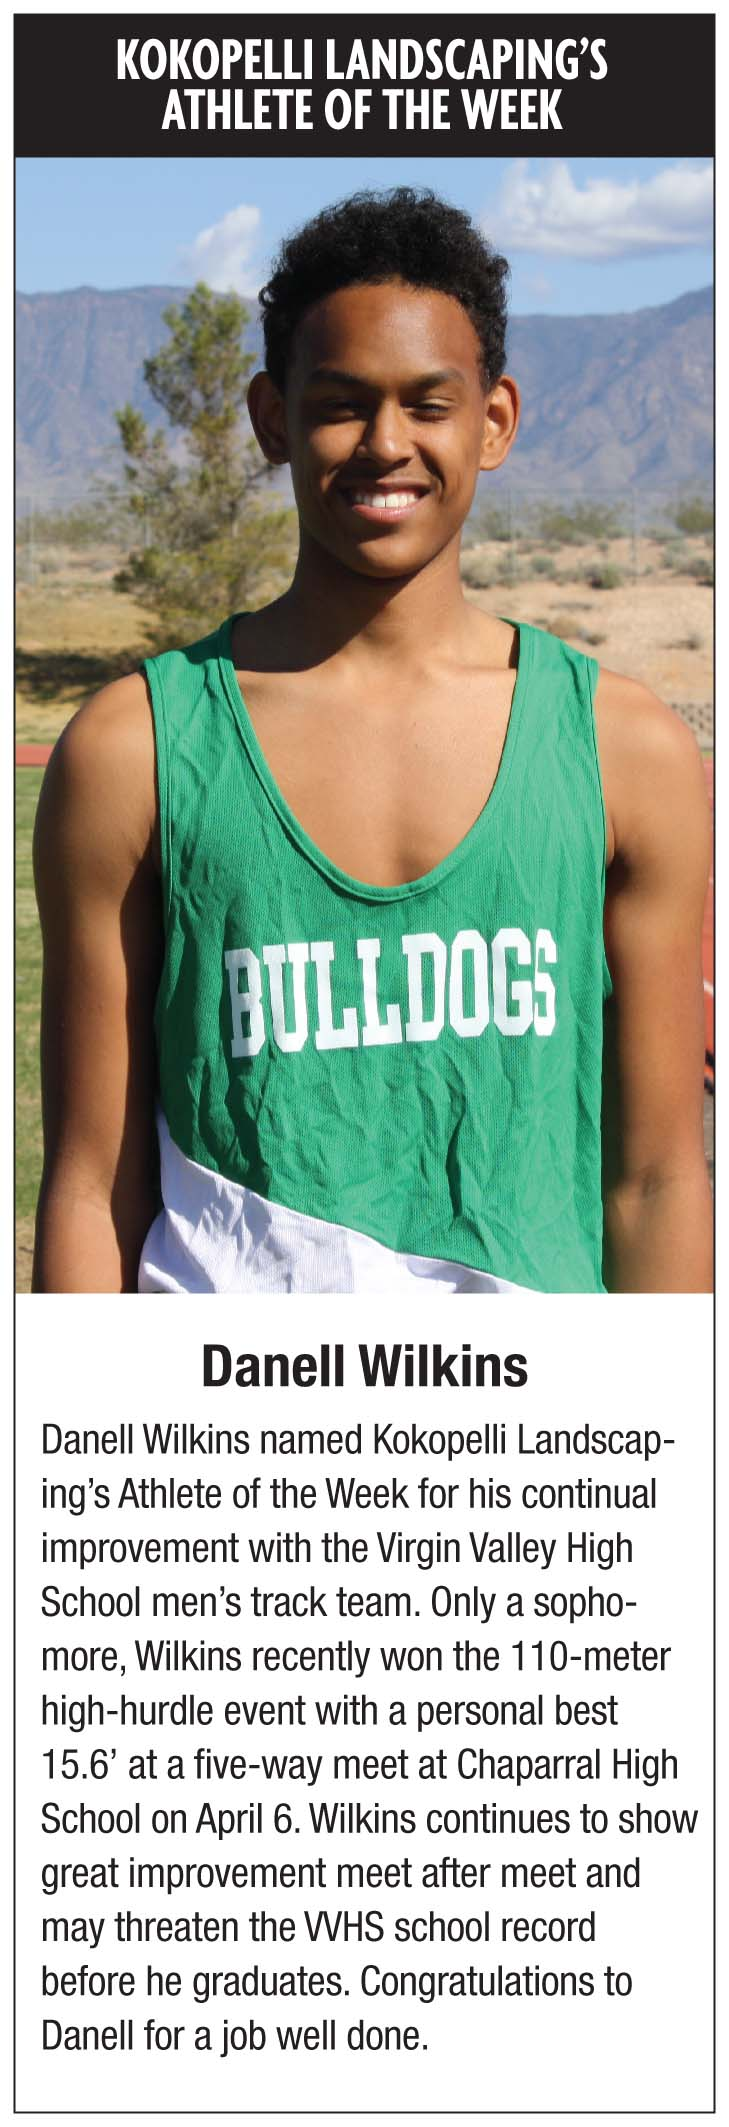 Danell Wilkins-Kokopelli Althete of the Week 4-14-16